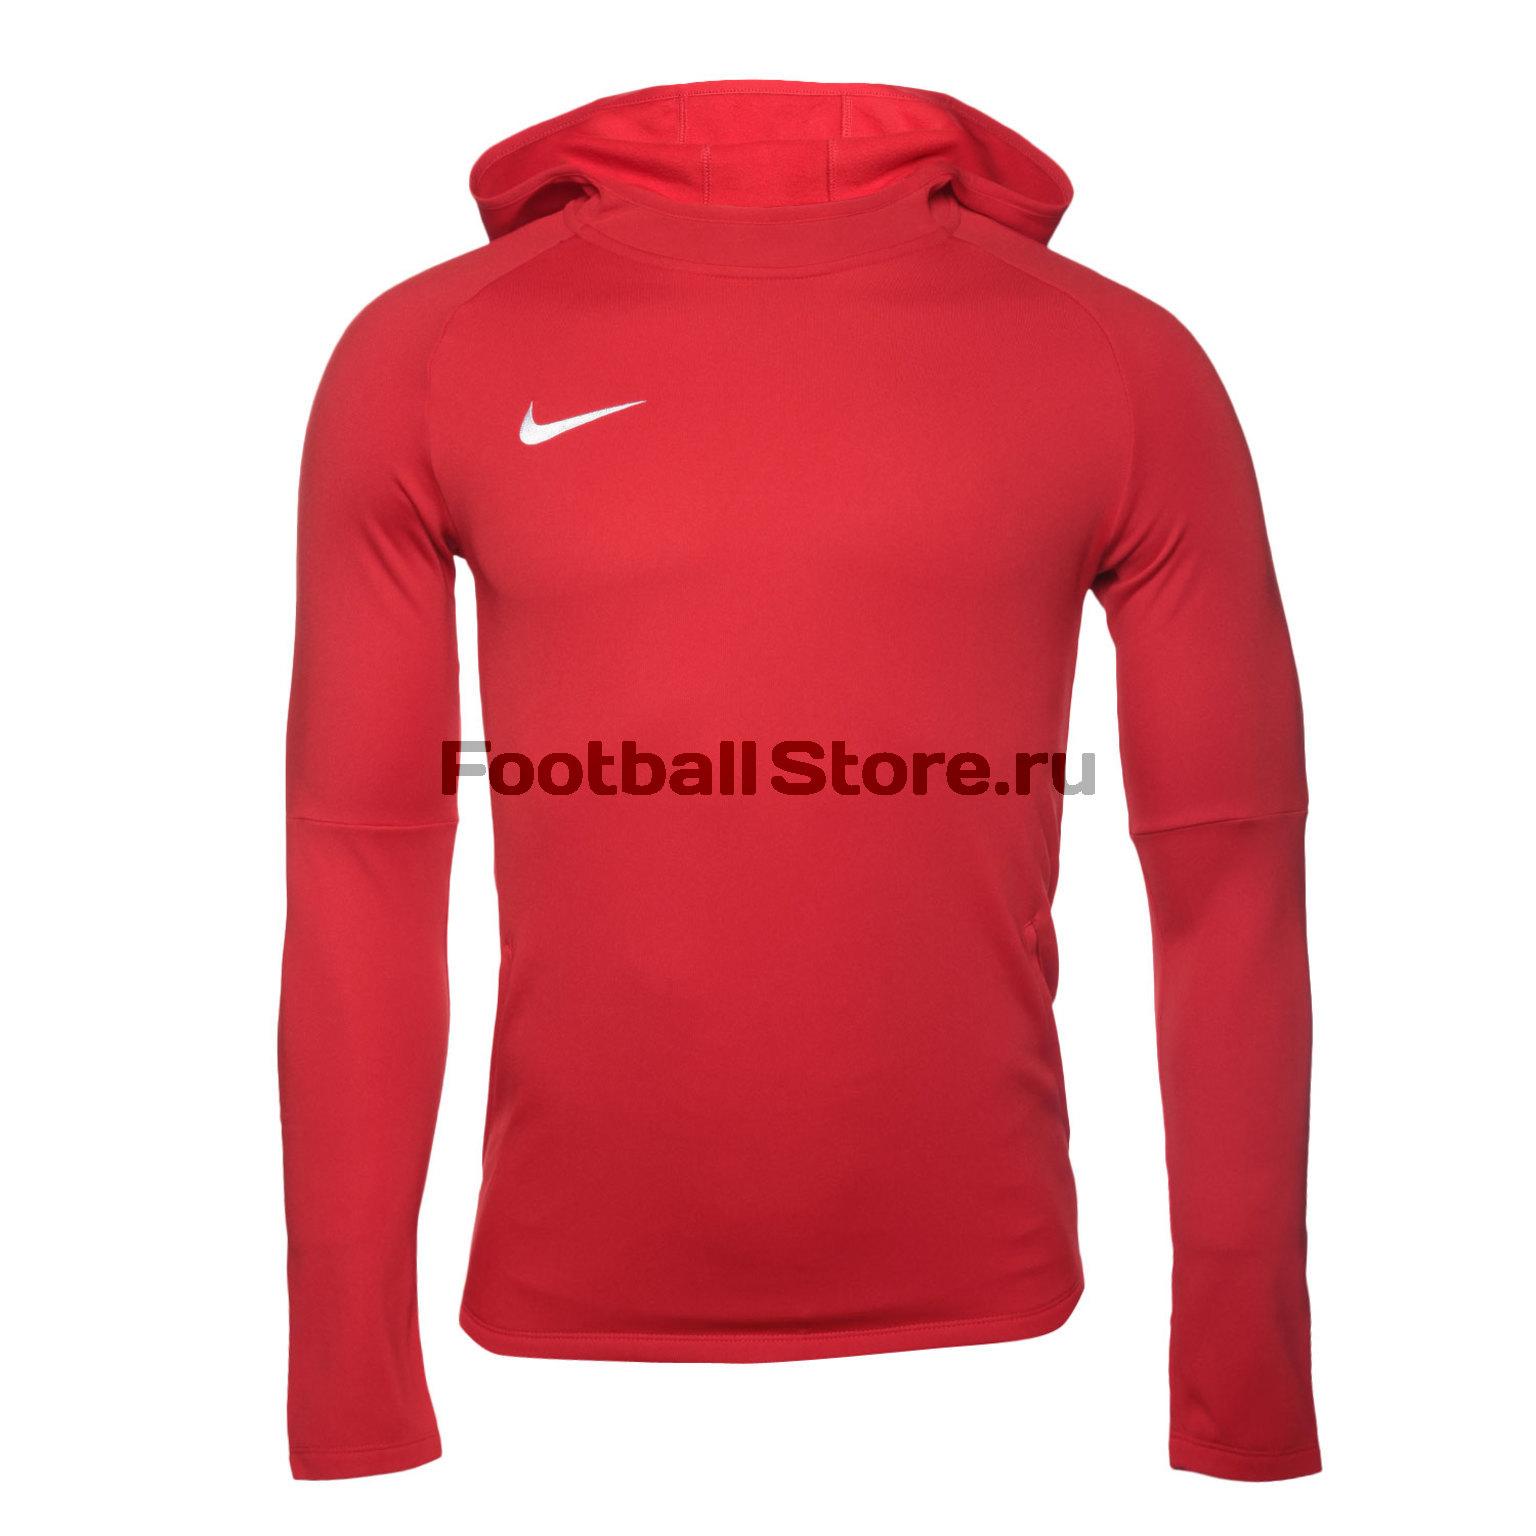 1289acbb Толстовка Nike Dry Academy18 Hoodie PO AH9608-657 – купить в интернет  магазине footballstore, цена, фото